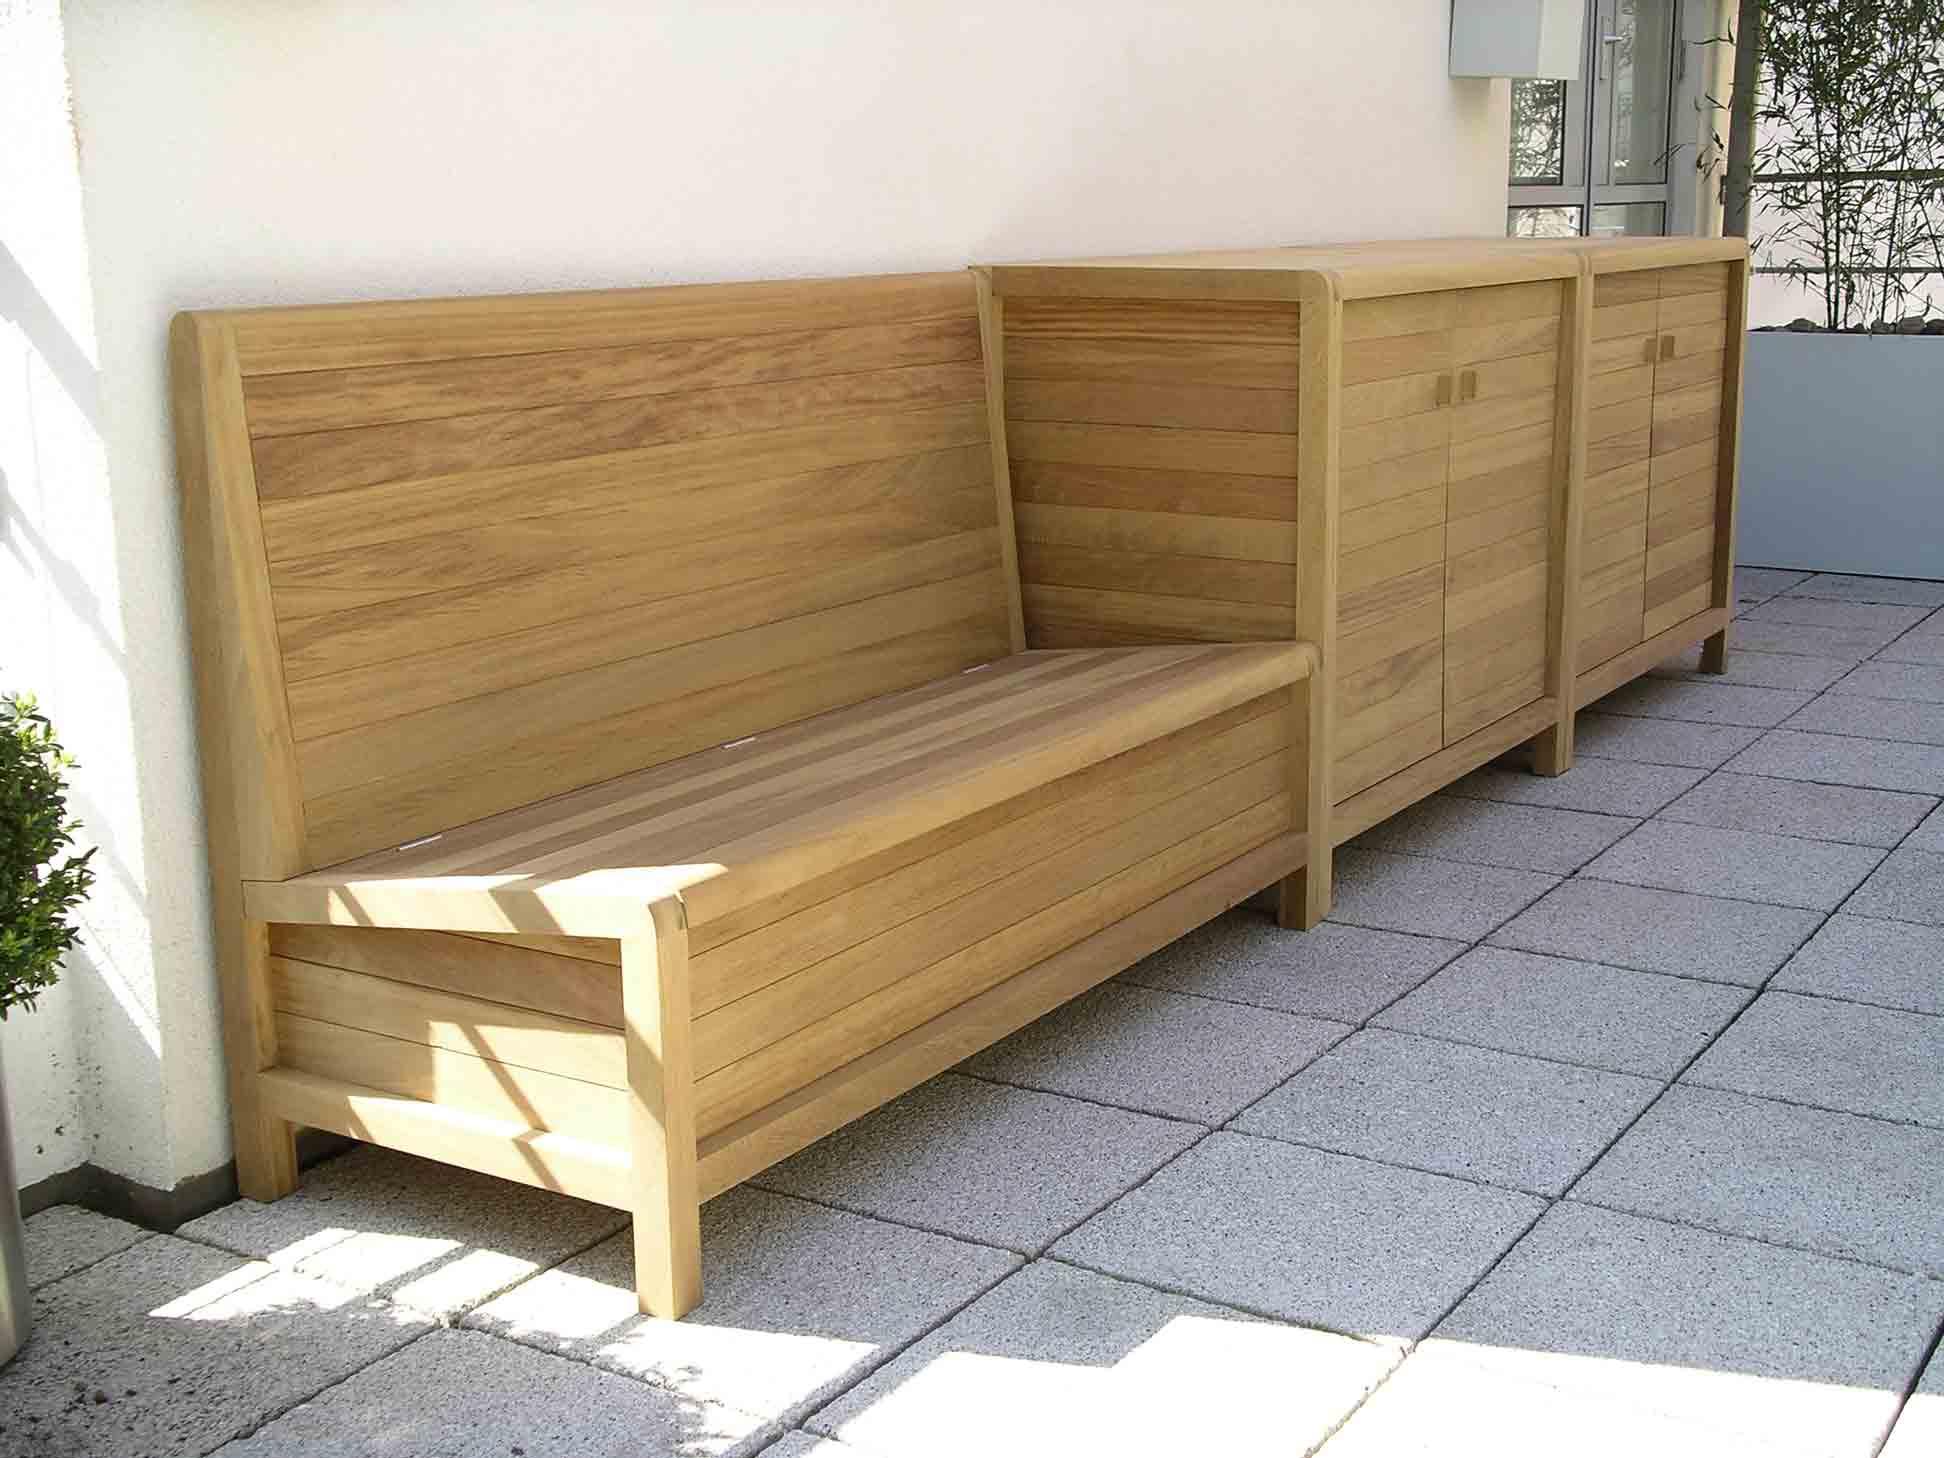 Iroko hardwood patio furniture by Peter Henderson